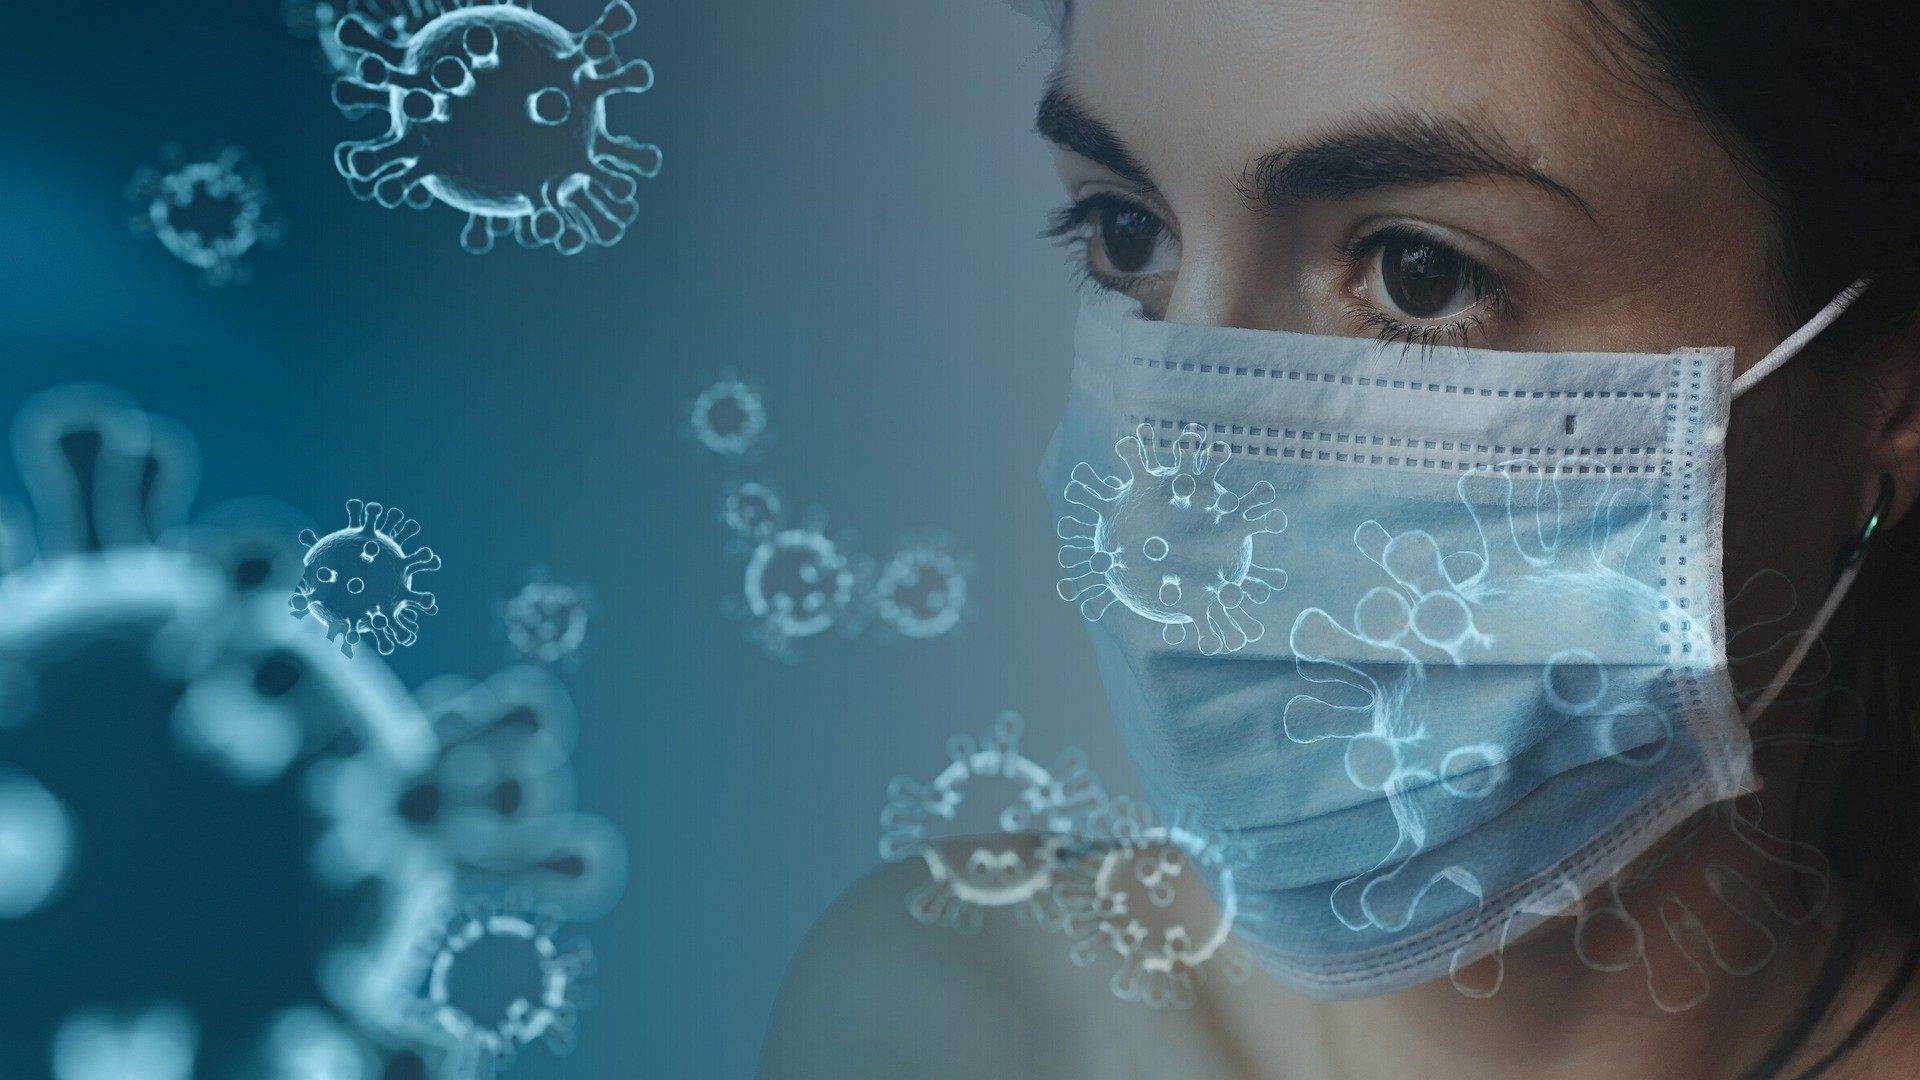 Shamash Technologies y Shamash Health colaboran contra el COVID-19